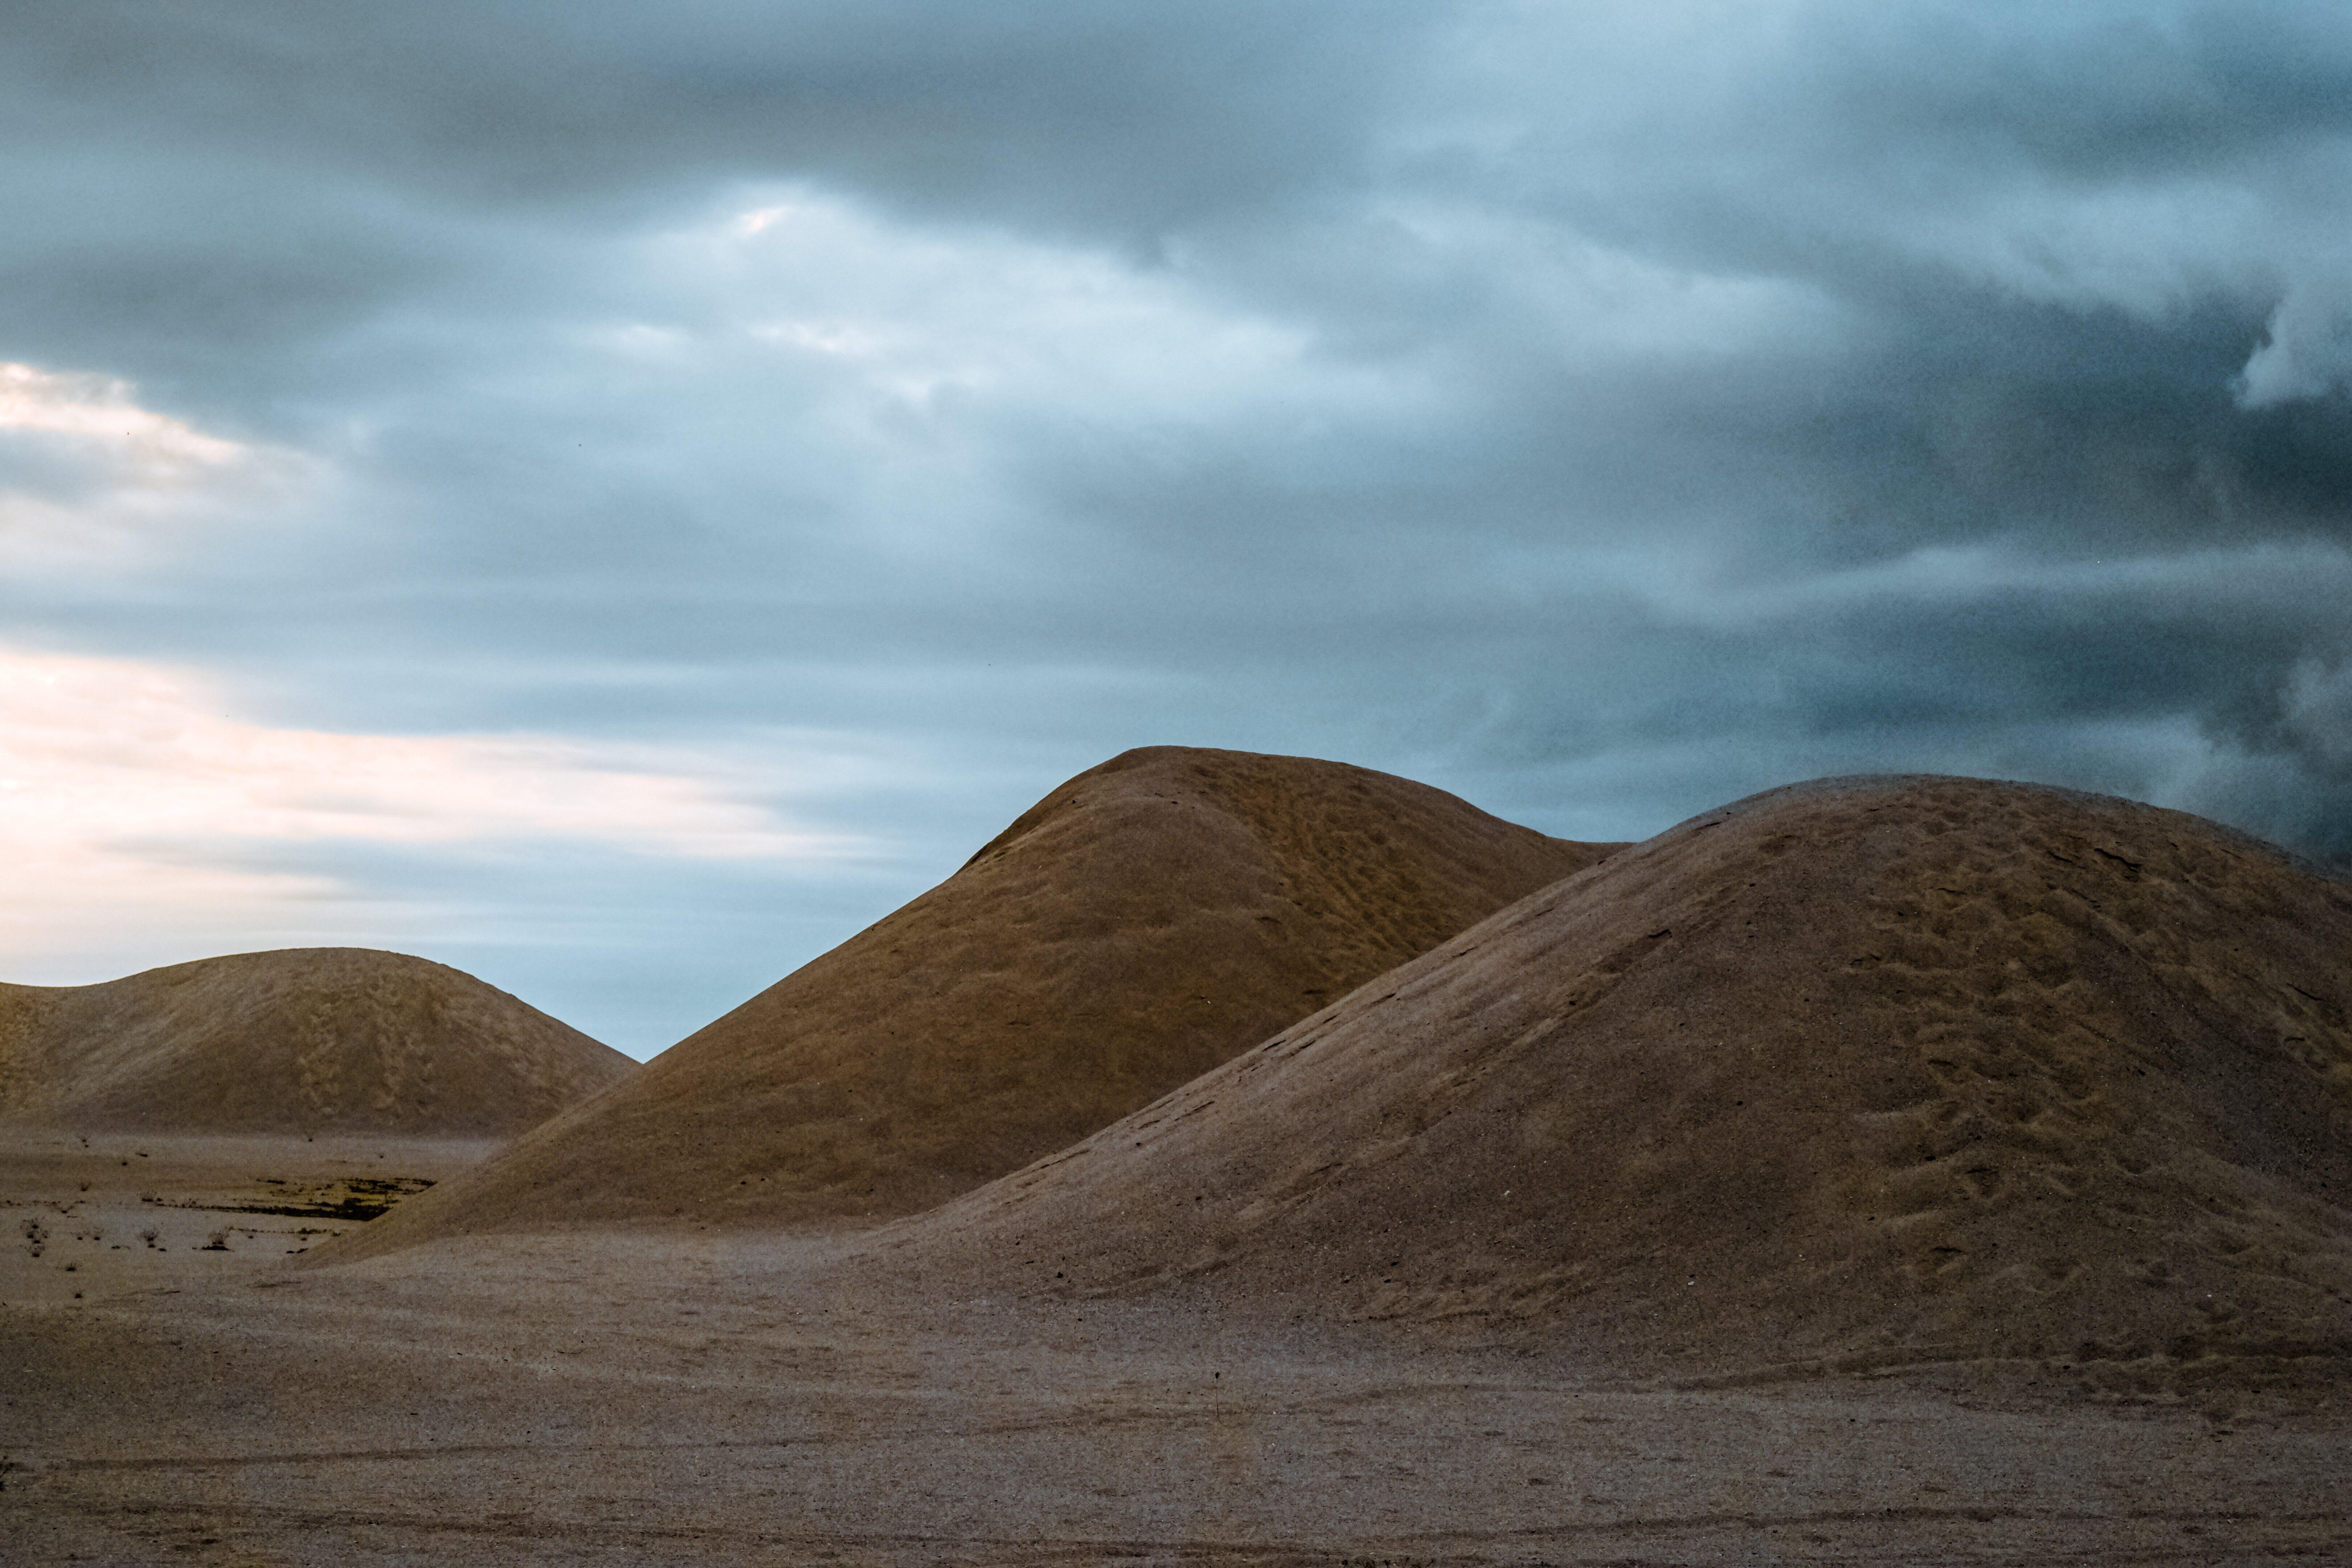 Desert during Cloudy Sky